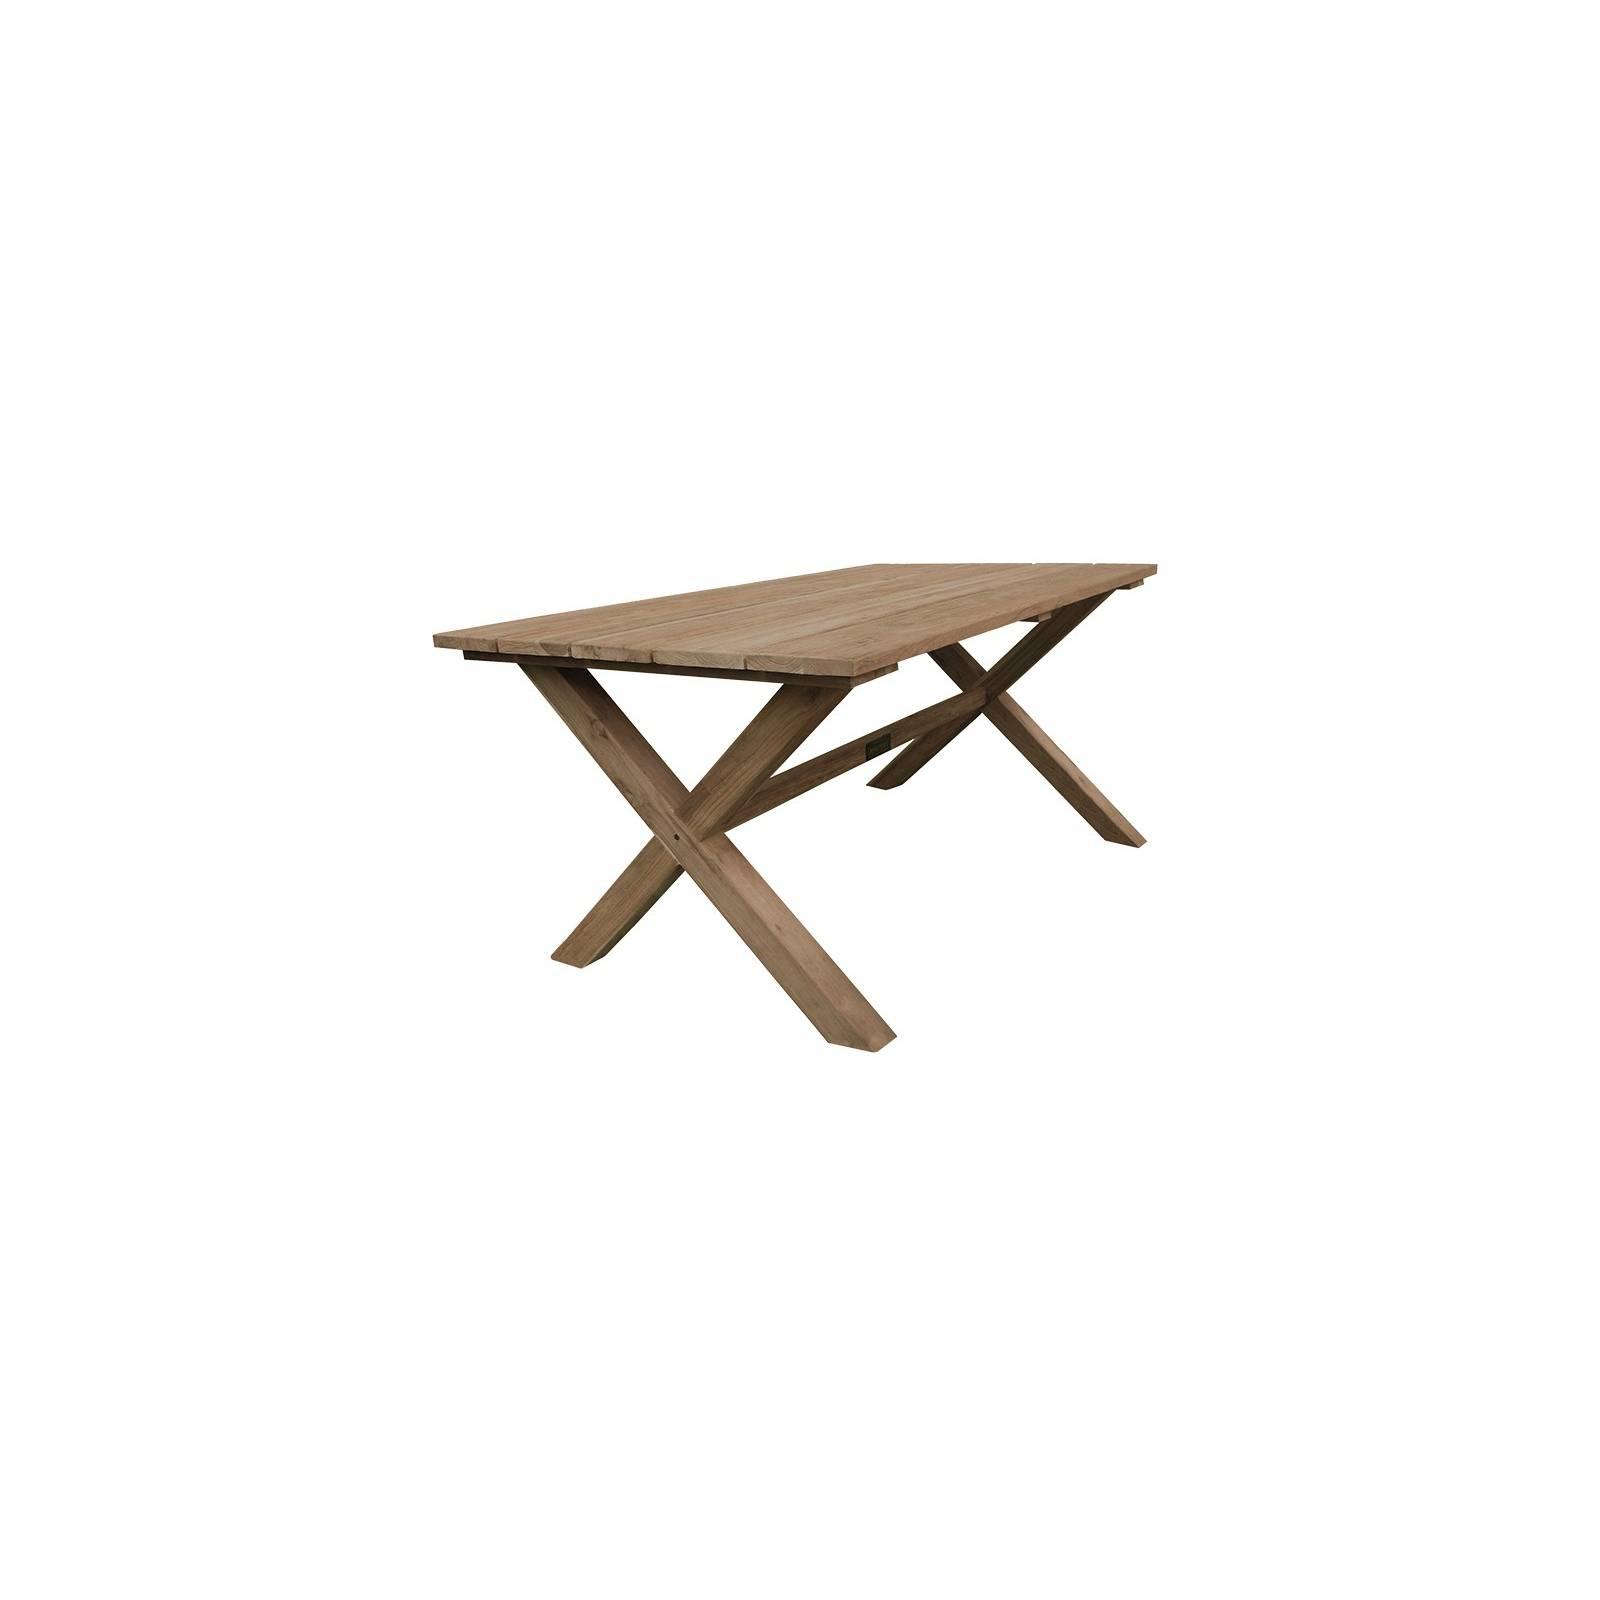 table de repas croisillons greenface teck recycl jardin teck. Black Bedroom Furniture Sets. Home Design Ideas